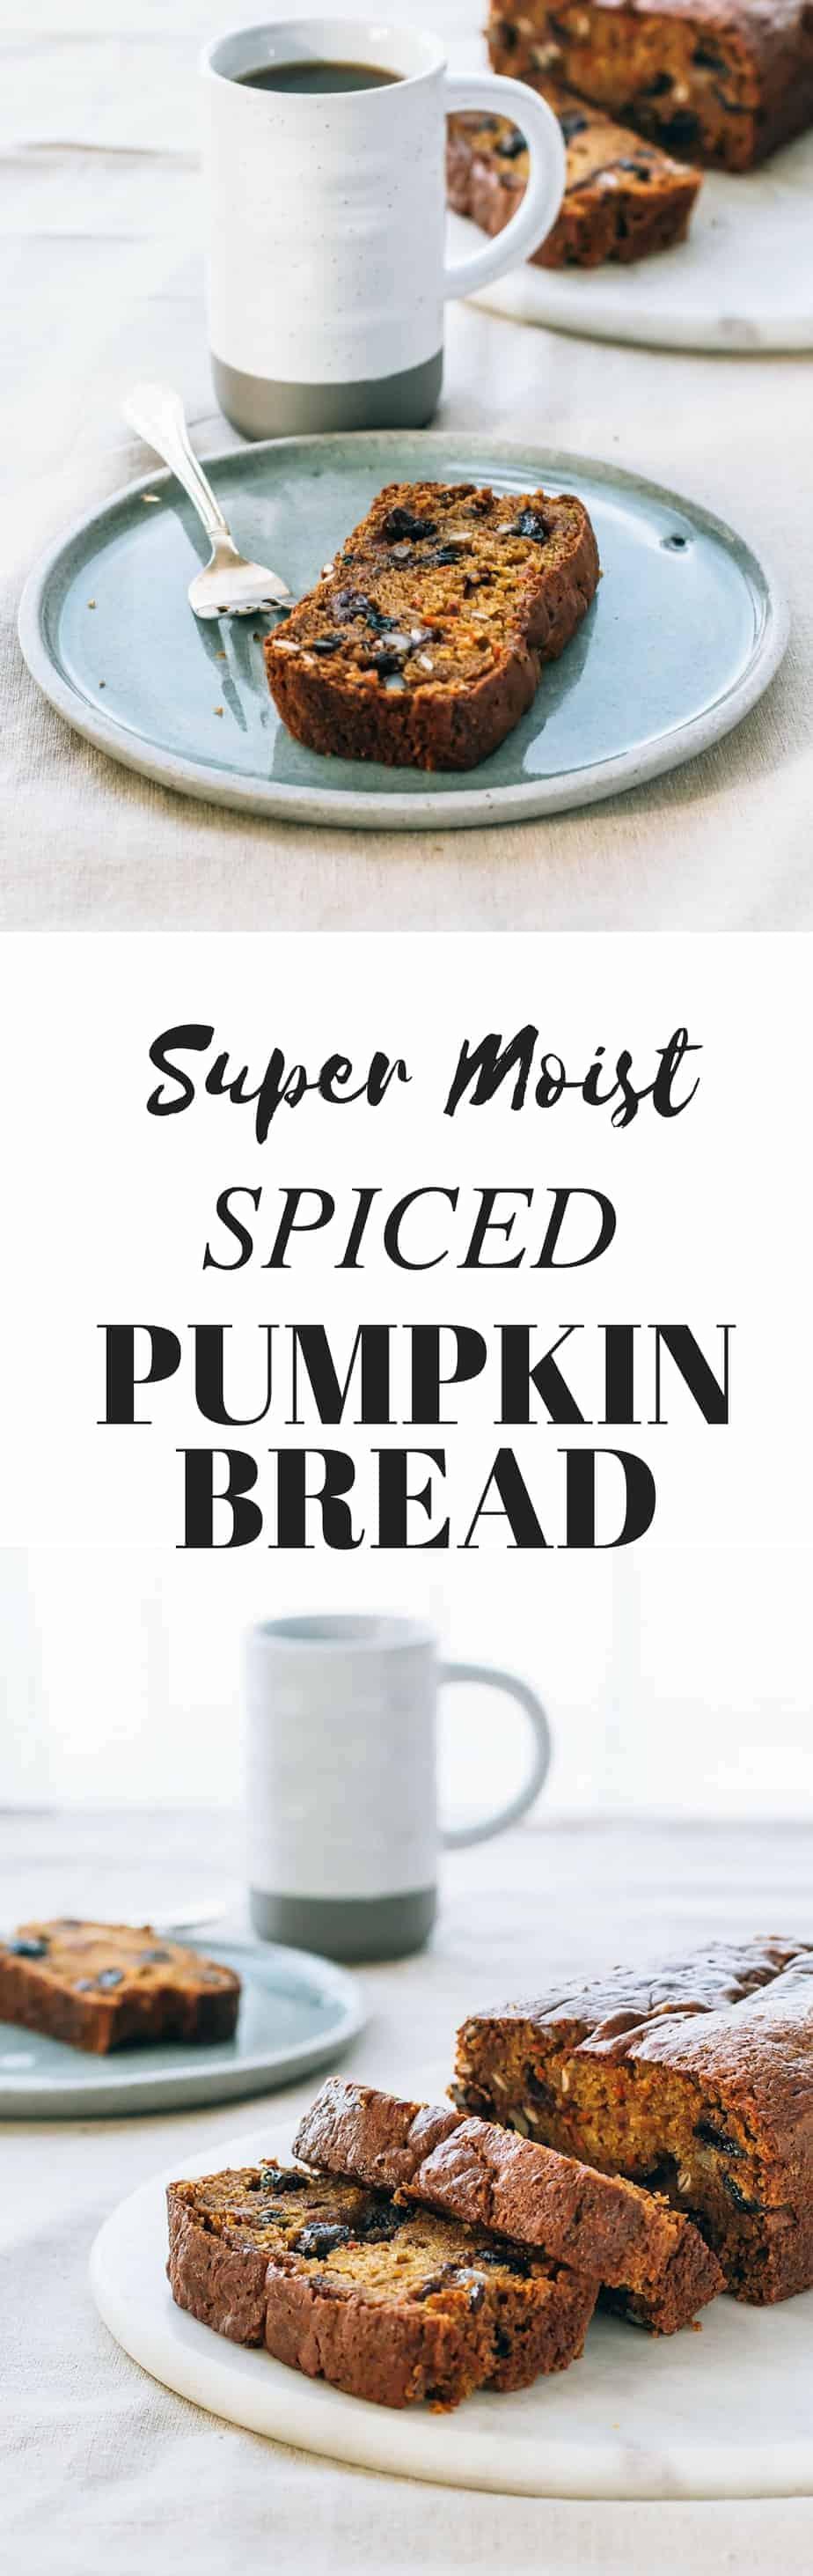 super moist spiced pumpkin bread recipe. Easy fall bake good recipe.